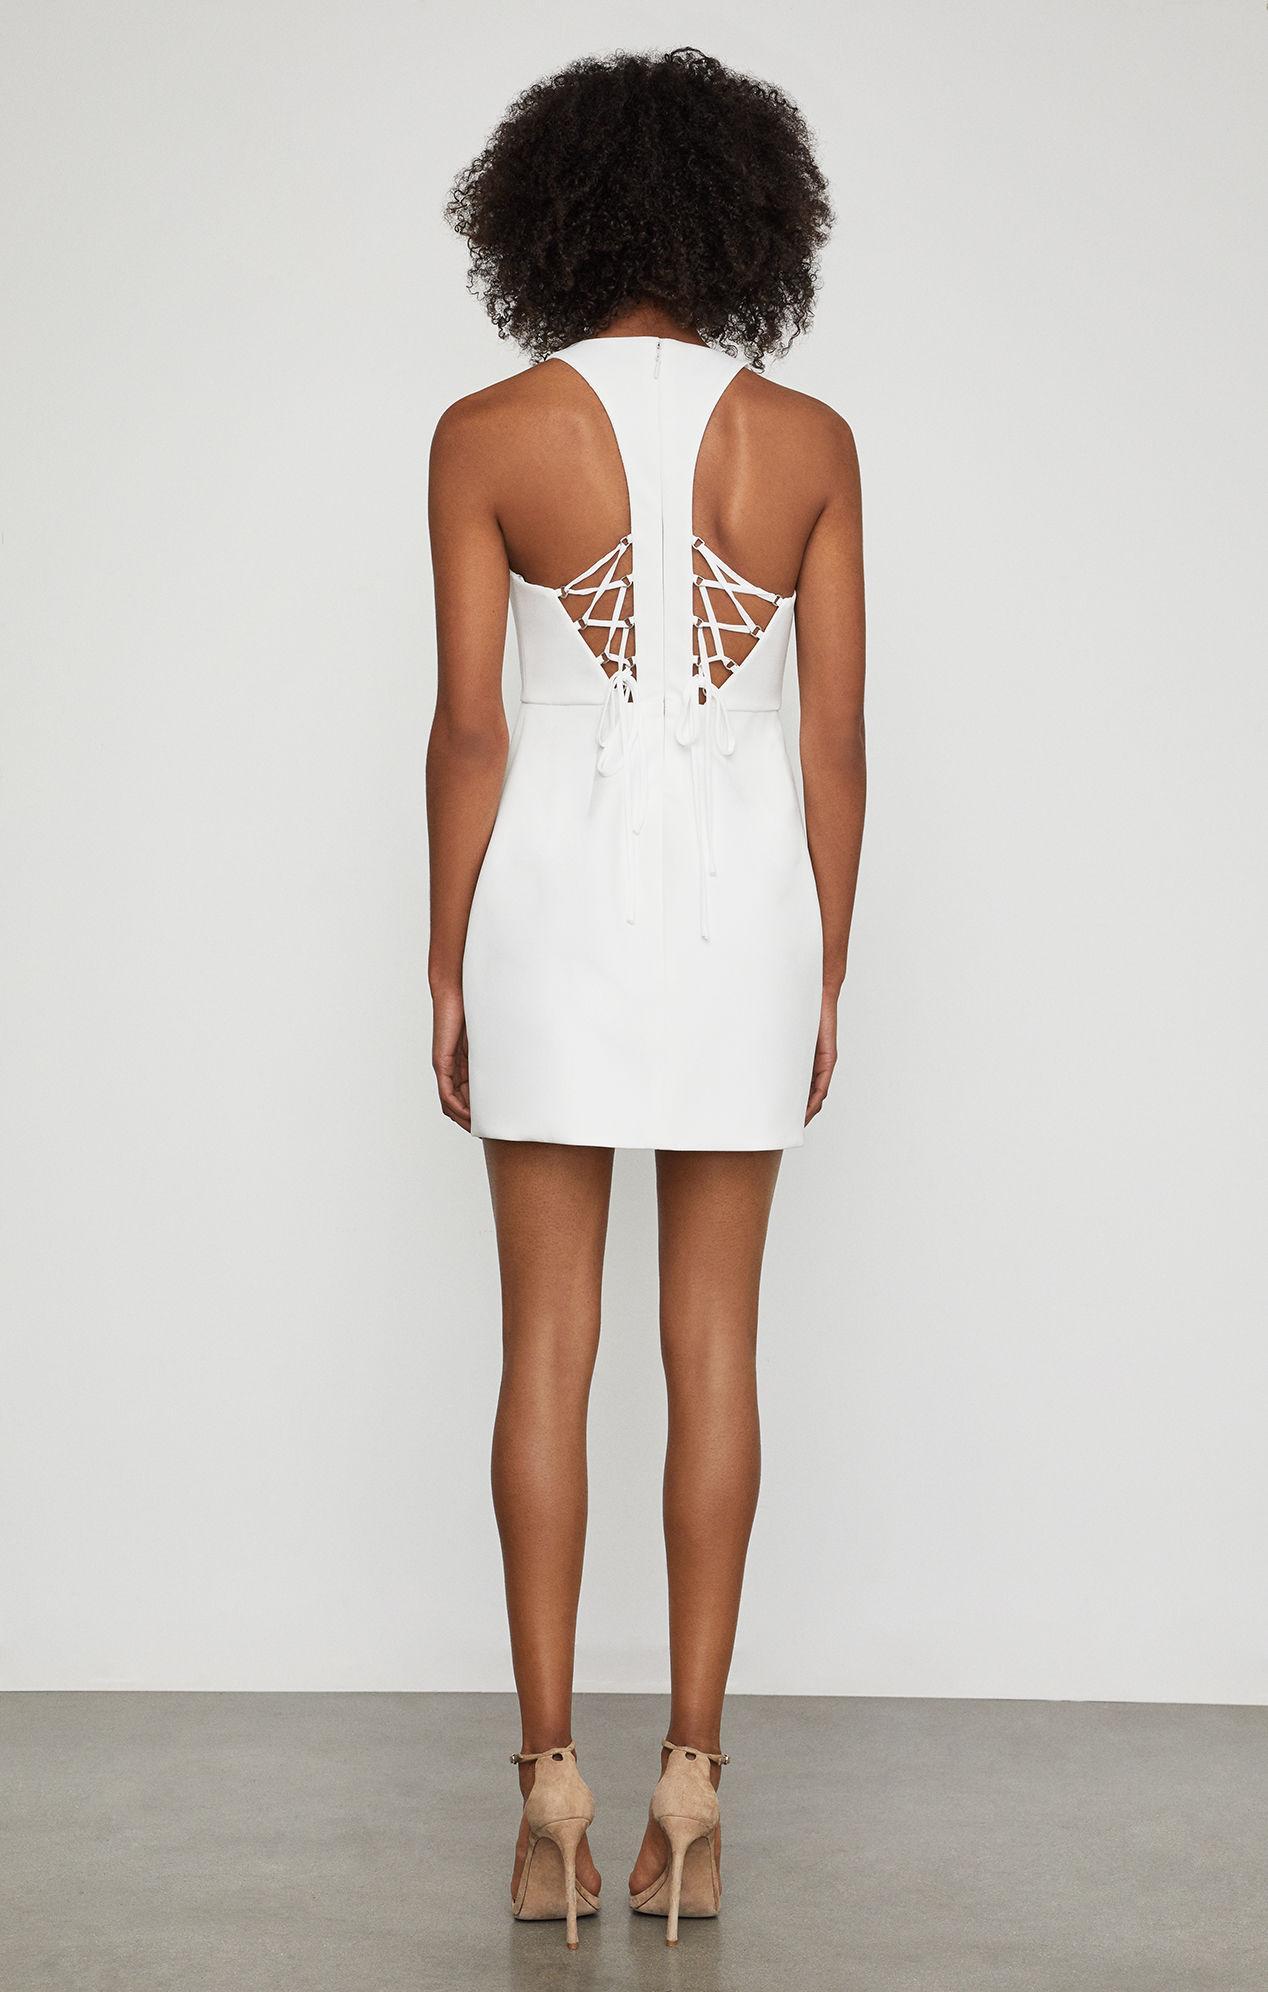 84cd98c38c08b BCBGMAXAZRIA Bcbg Ely Lace-up Halter Dress in White - Lyst